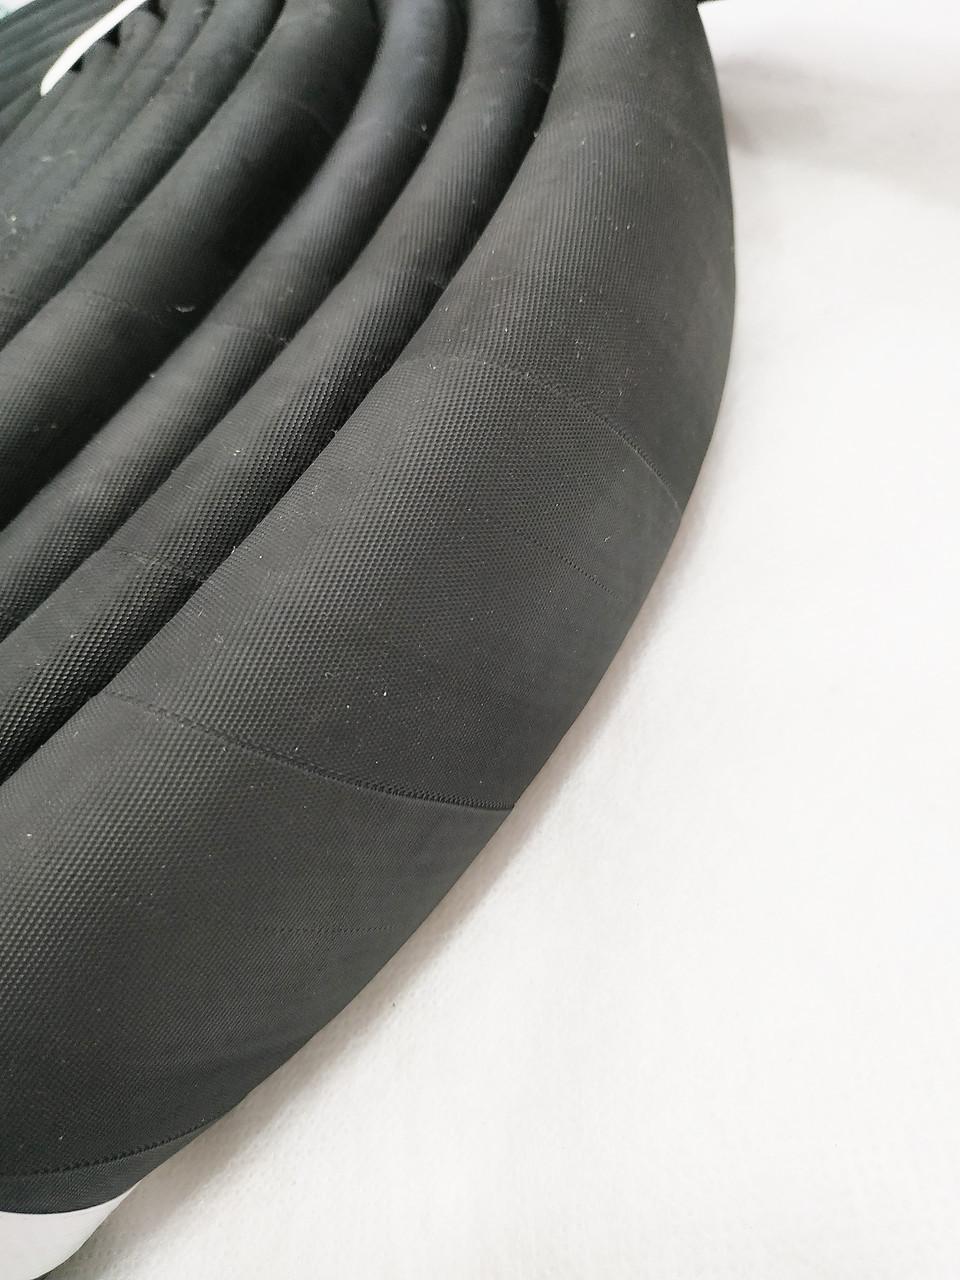 "Напорный рукав Ø 20 мм. 10м. Бинтованный.ВГ(ІІІ)(техническая вода). ""Билпромрукав"" .Высокого давления."